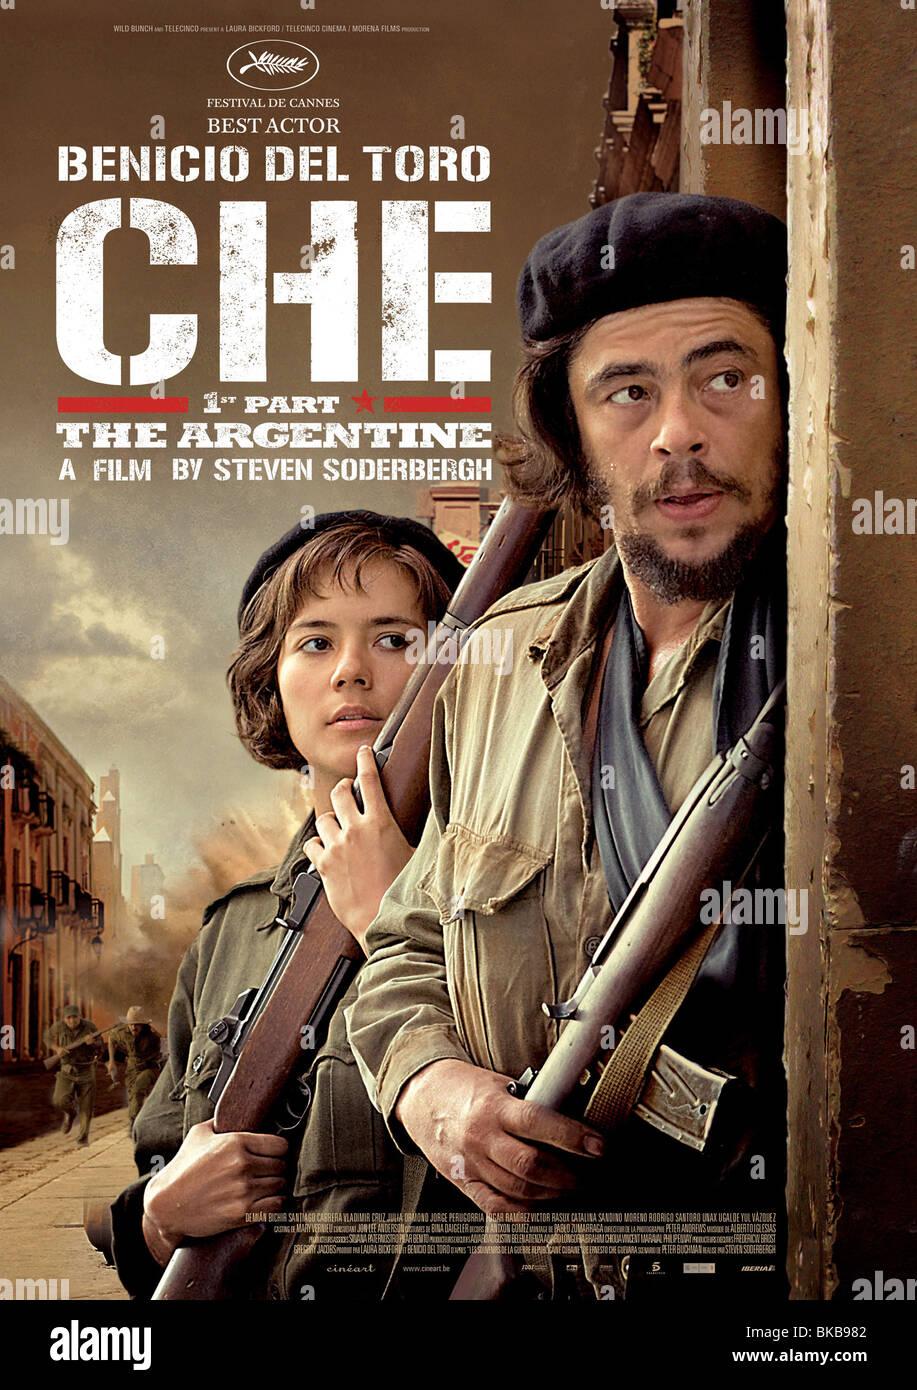 Director Soderbergh Stephen: biography, best films